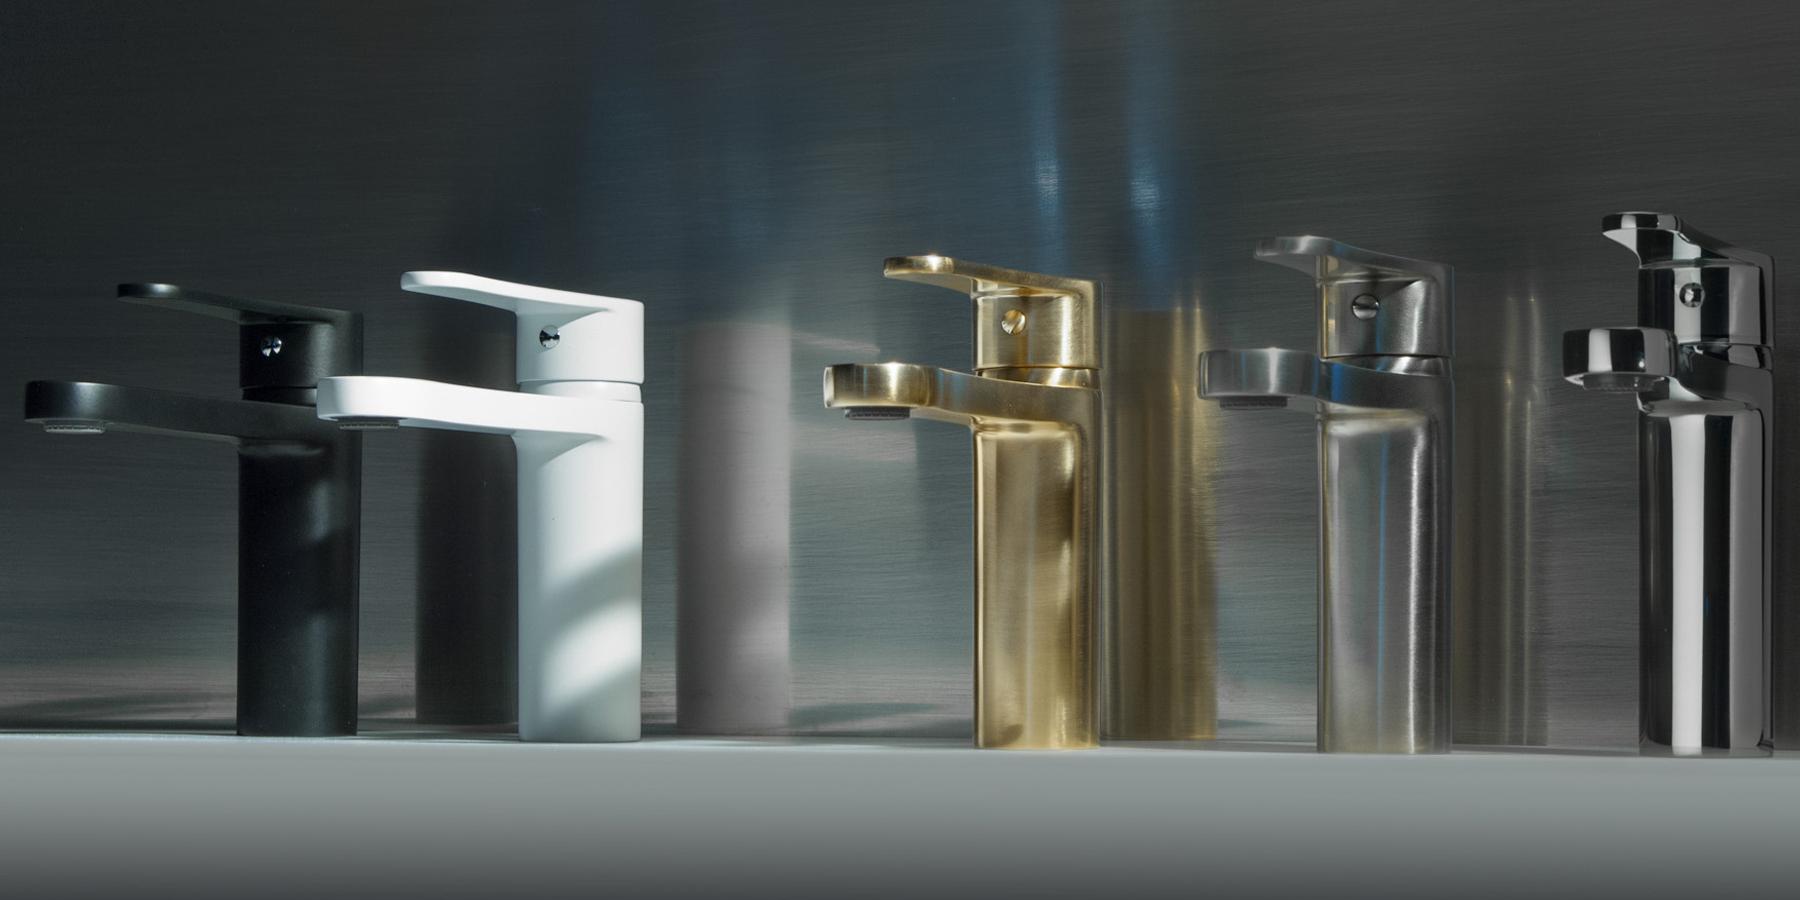 Italiaanse design badkamerkranen van bongio nieuws startpagina voor badkame italiaanse - Badkamer desi ...